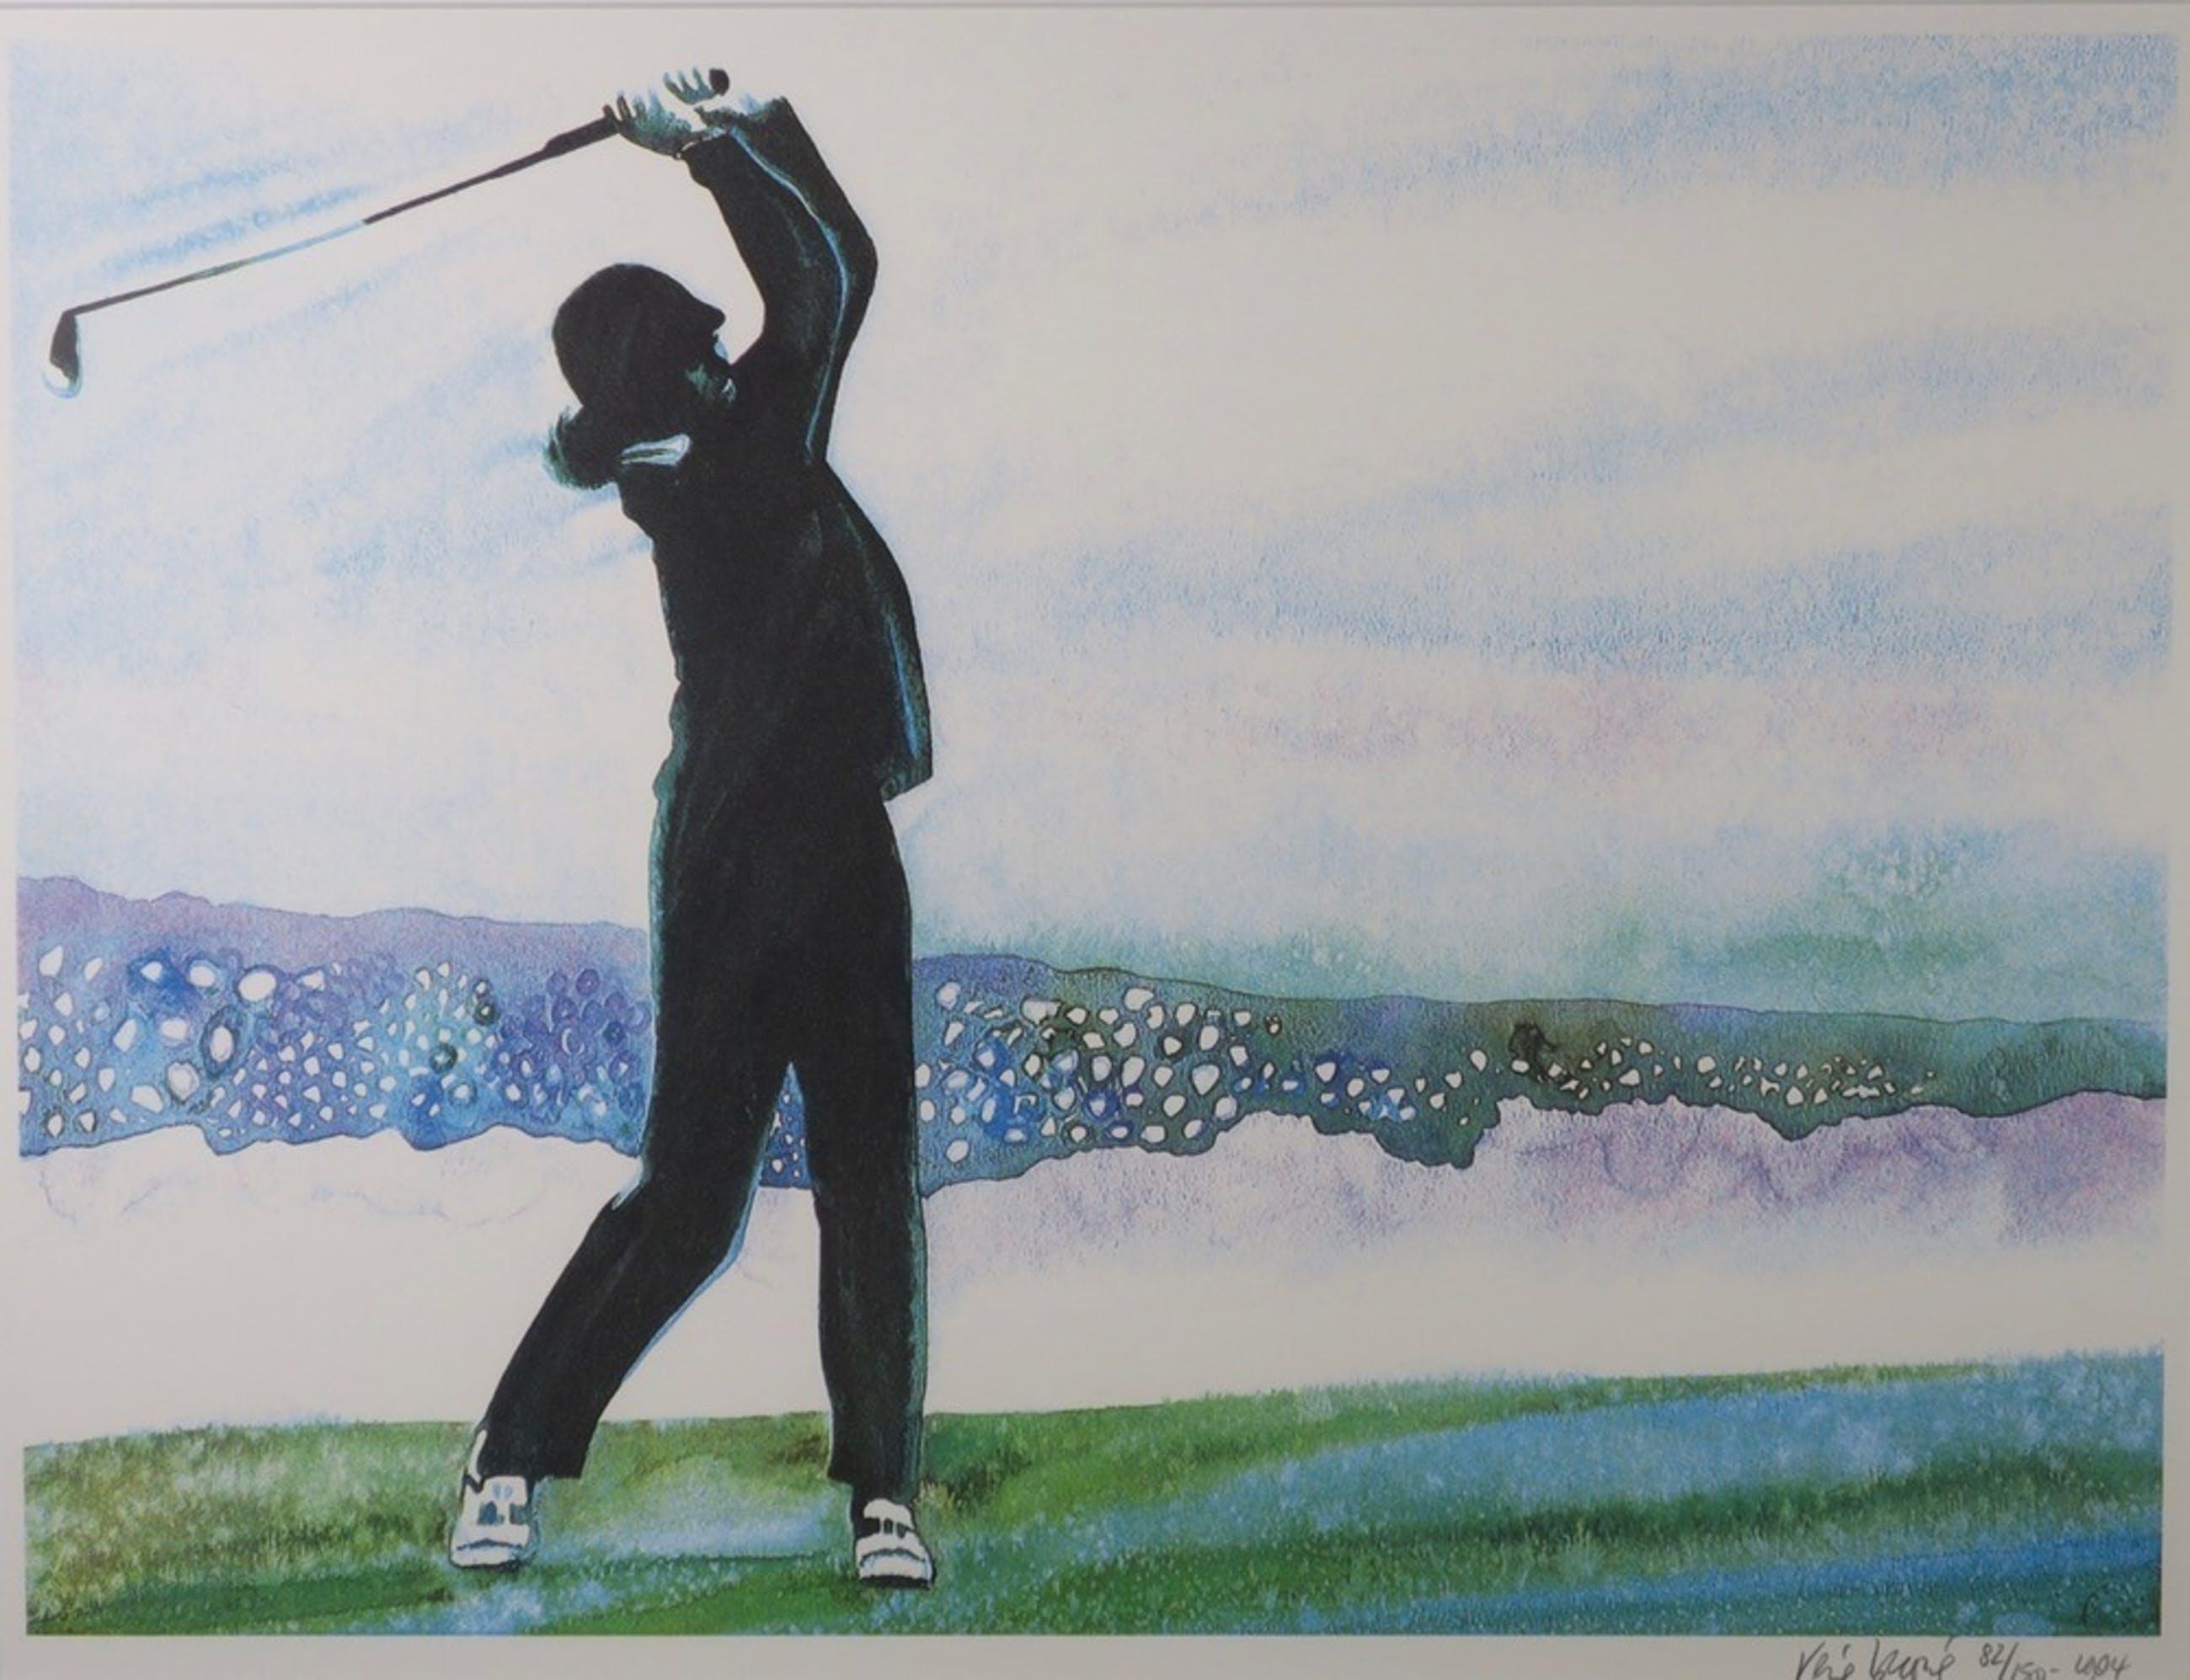 Rene Brone: Litho, Playing golf at peble beach - Ingelijst kopen? Bied vanaf 1!